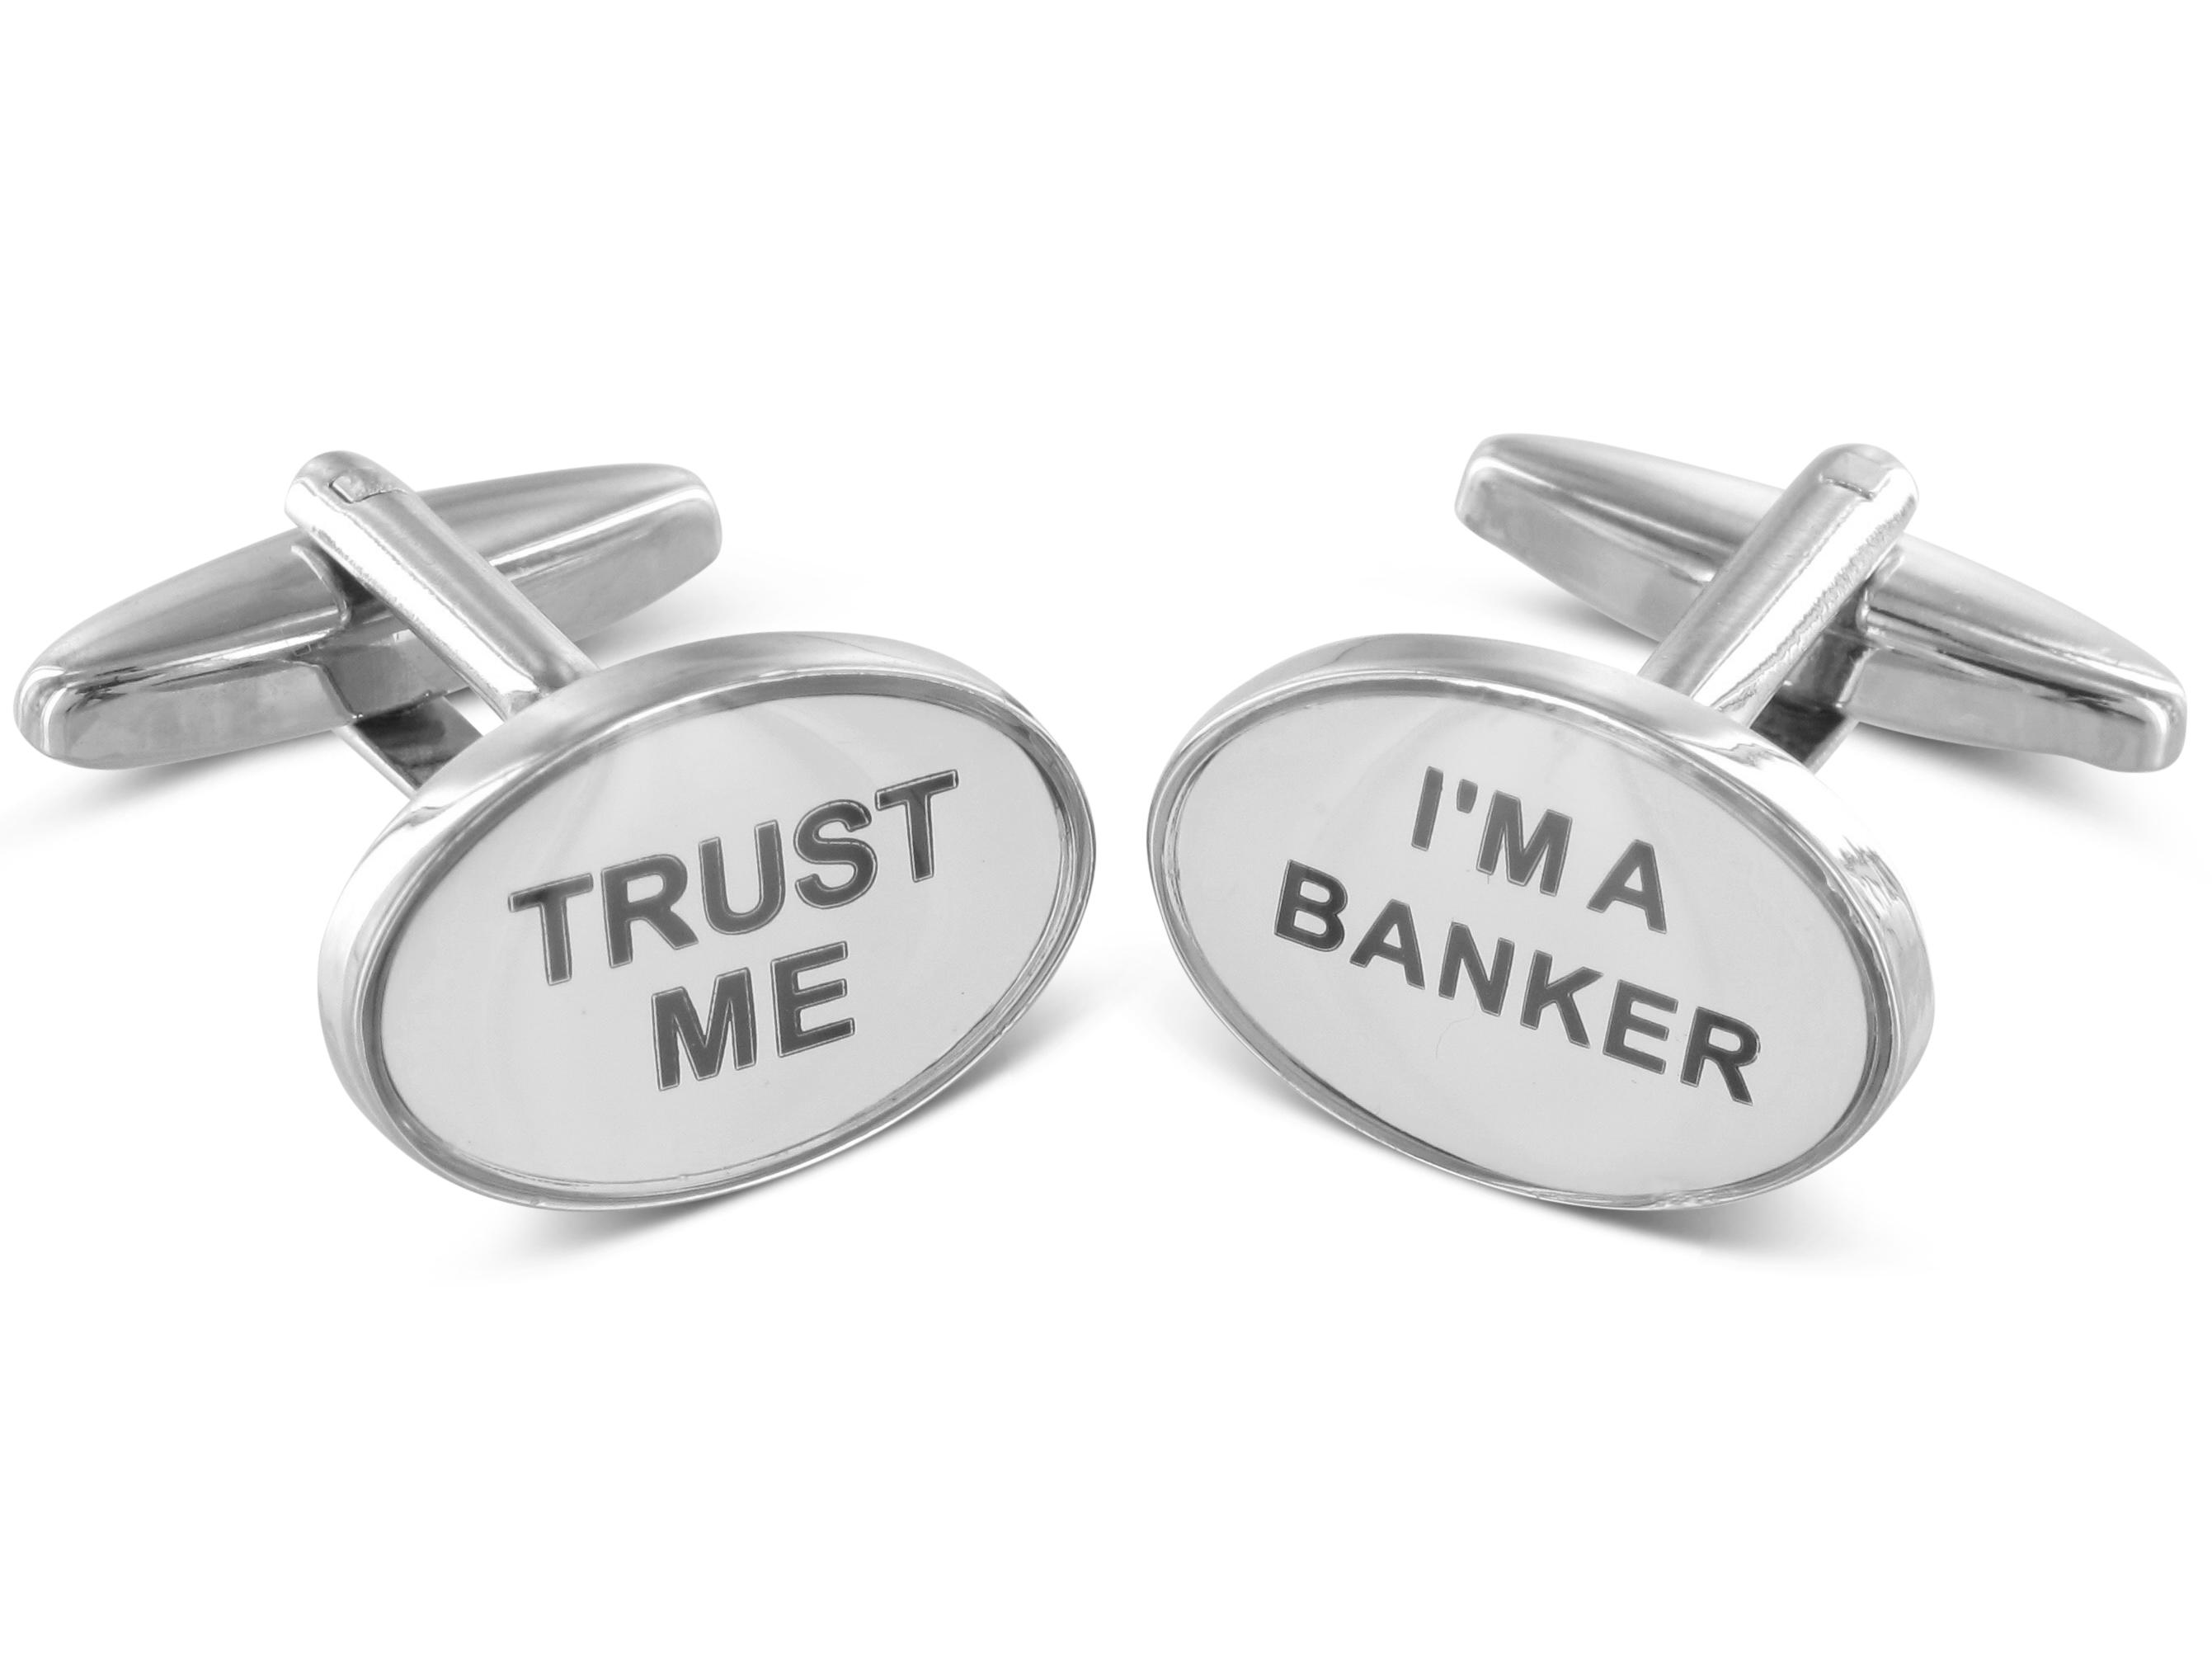 TEROON Manschettenknöpfe Trust me - I'm a banker